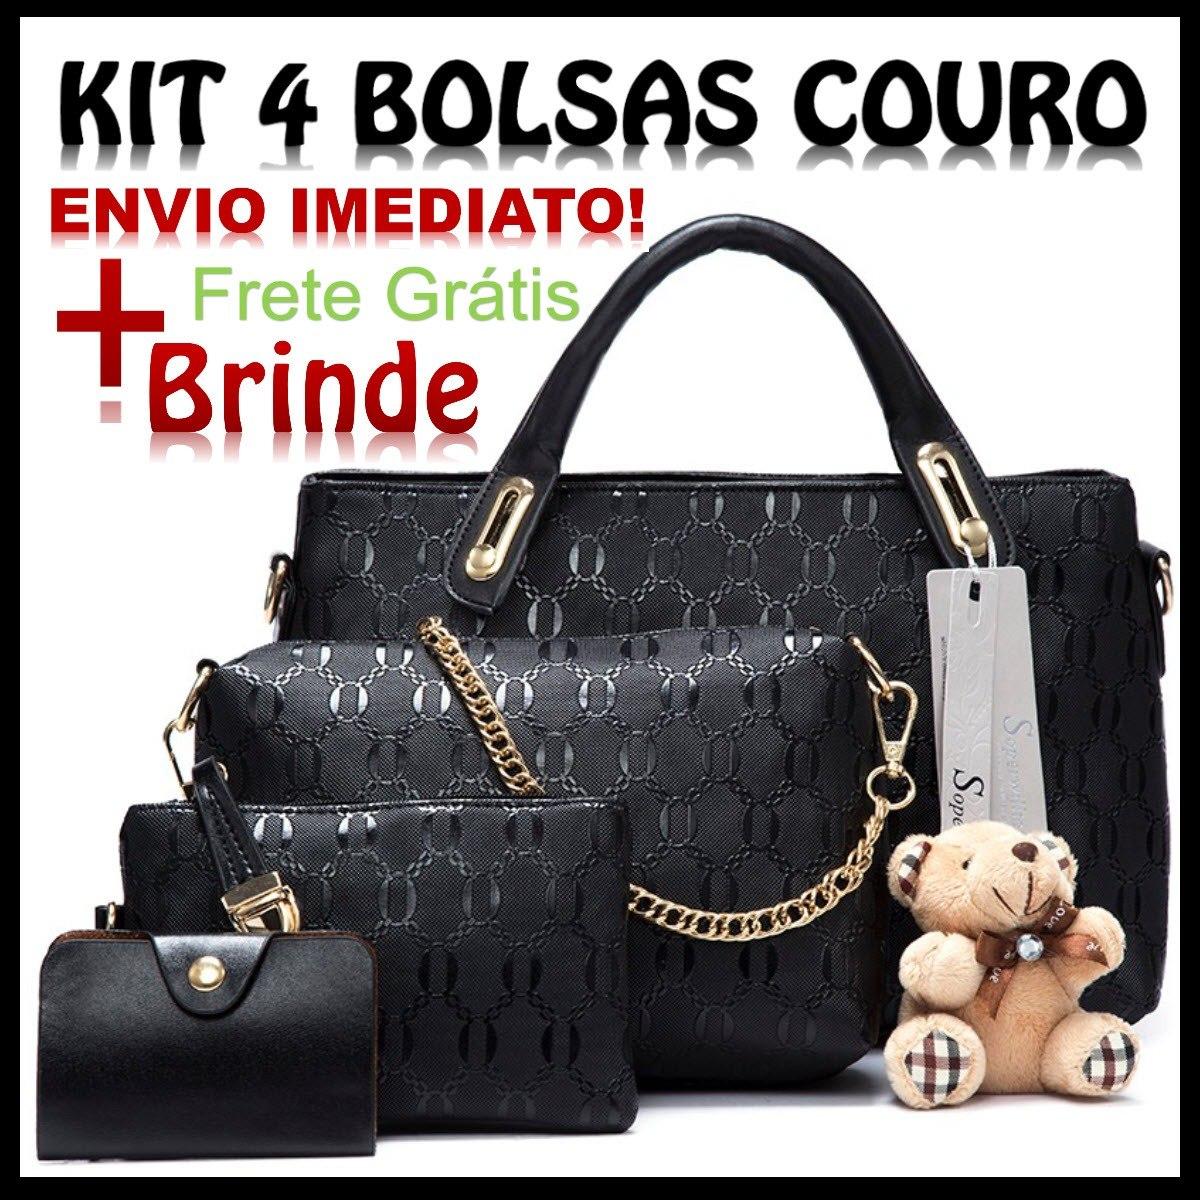 18ec75bed bolsa feminina kit 4 pecas couro pu + brinde envio imediato. Carregando  zoom.